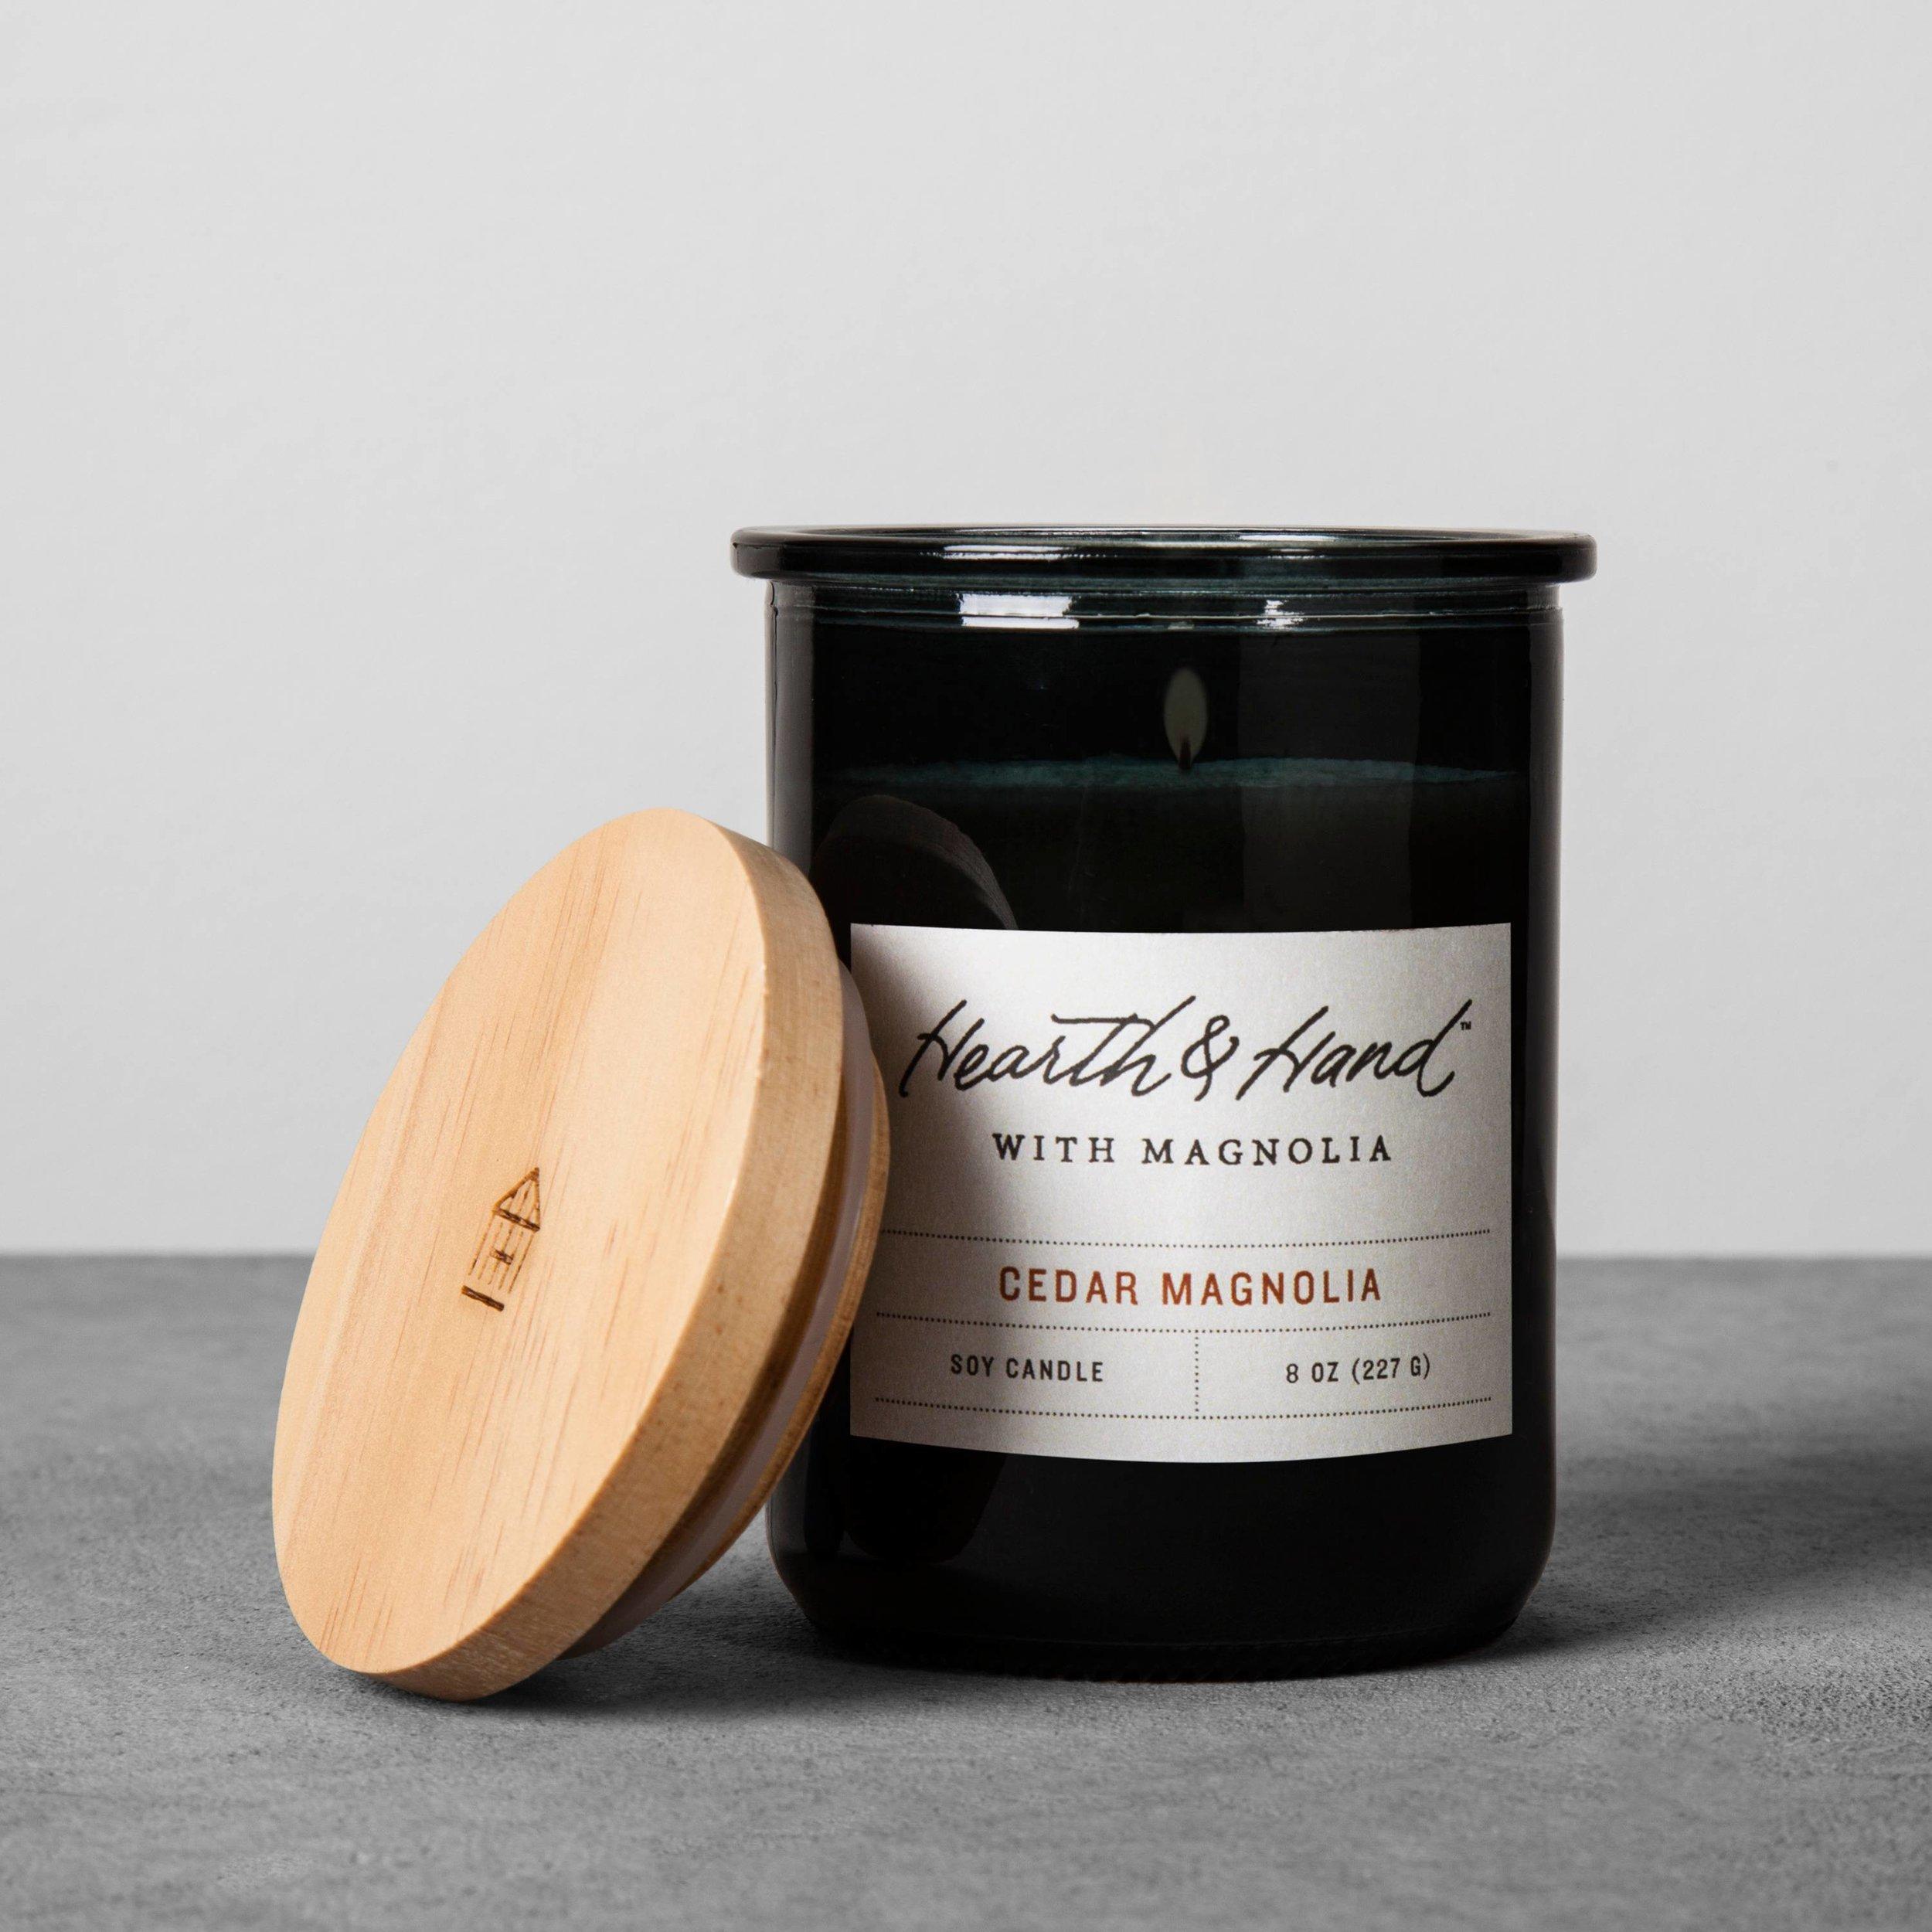 Cedar Magnolia Candle - Smells like heavenly Christmas.